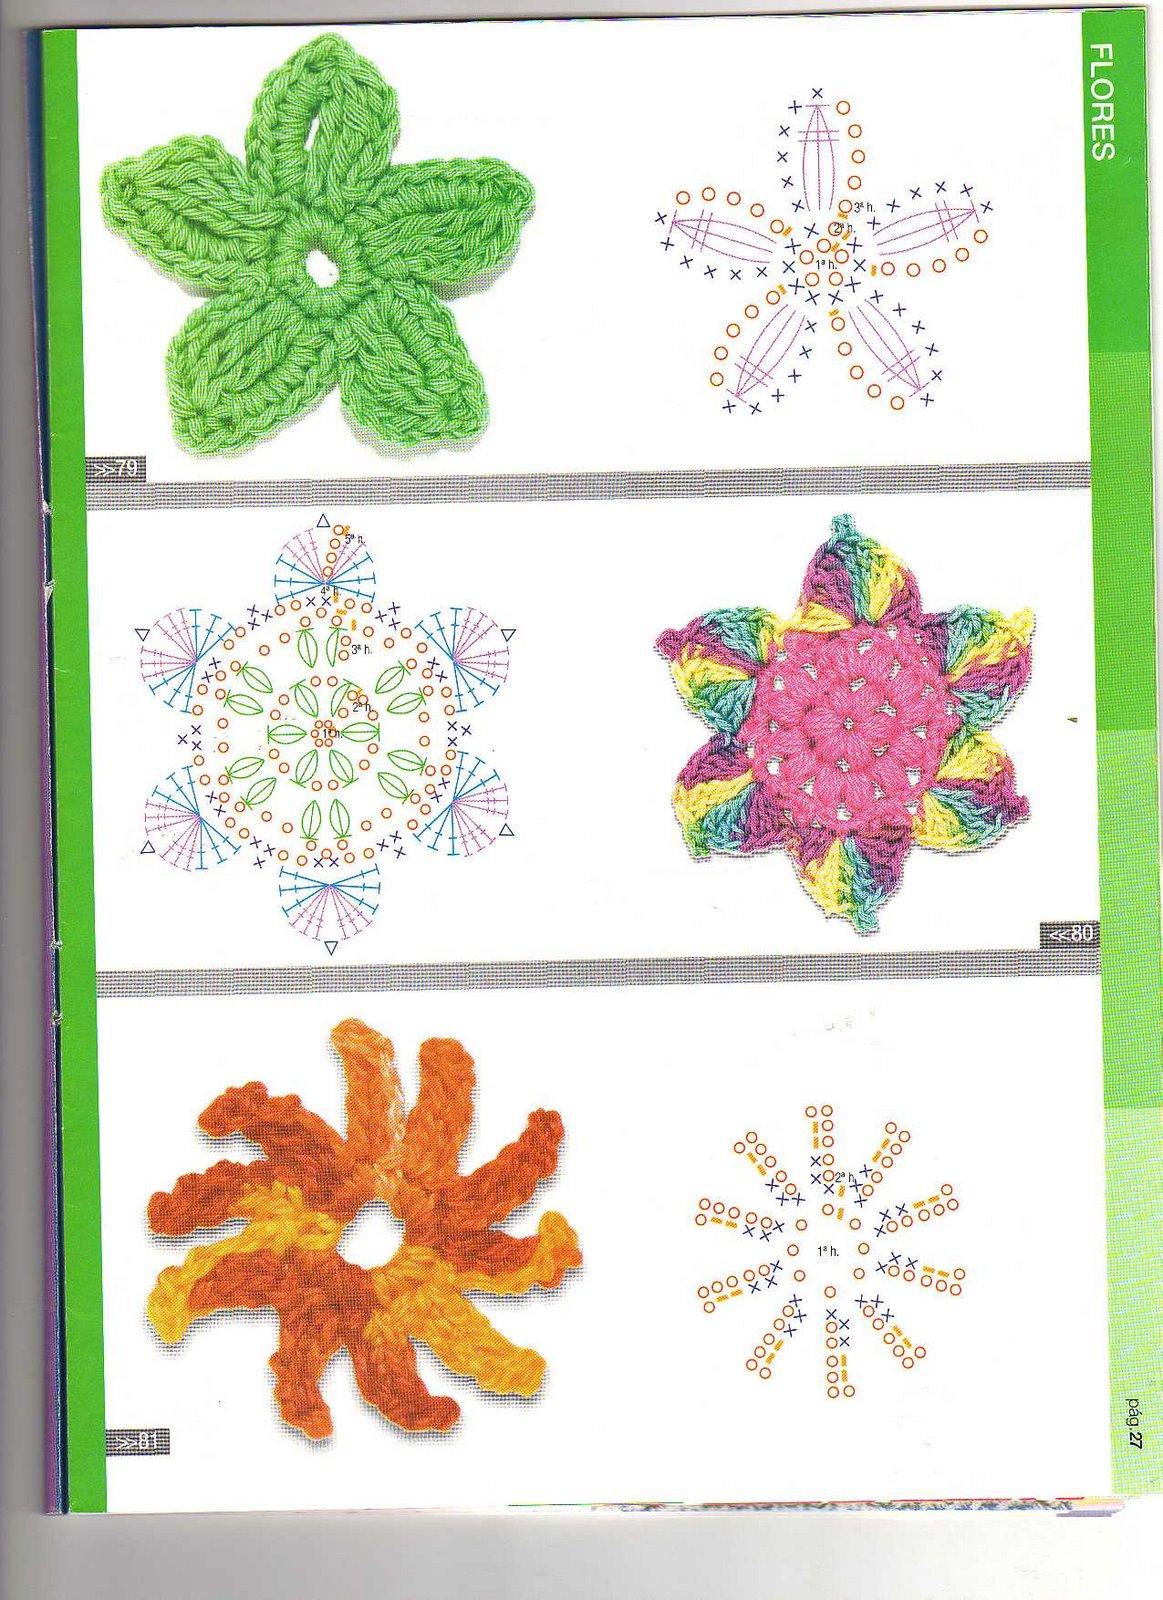 Motivos Crochet Cuadrados Mundo Crochet El Mejor Blog